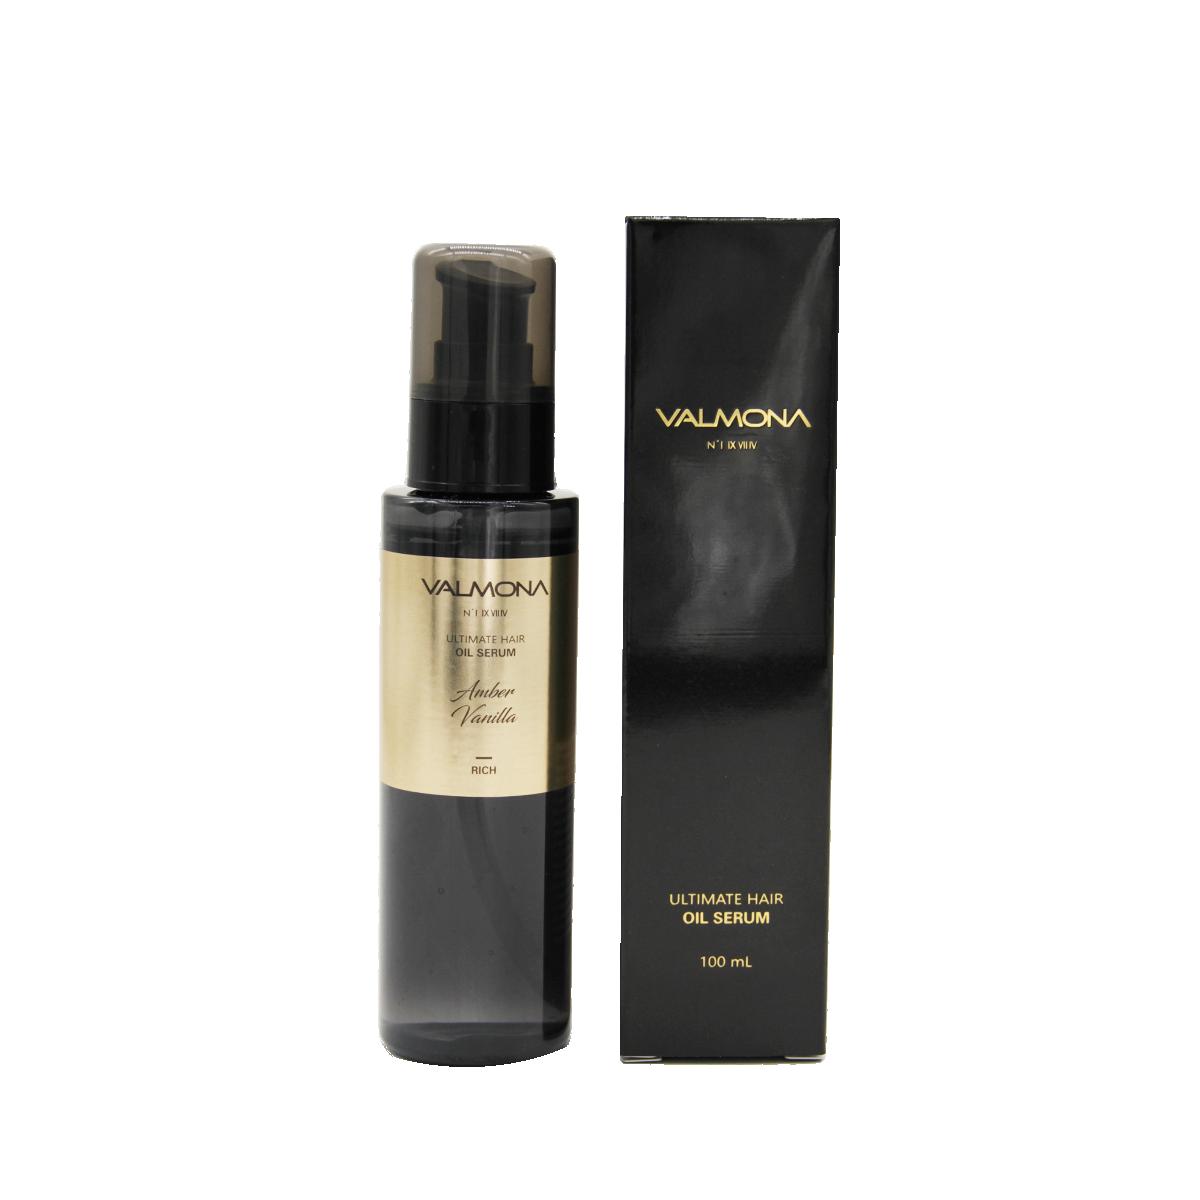 Valmona Ultimate Hair Oil Serum Vanila